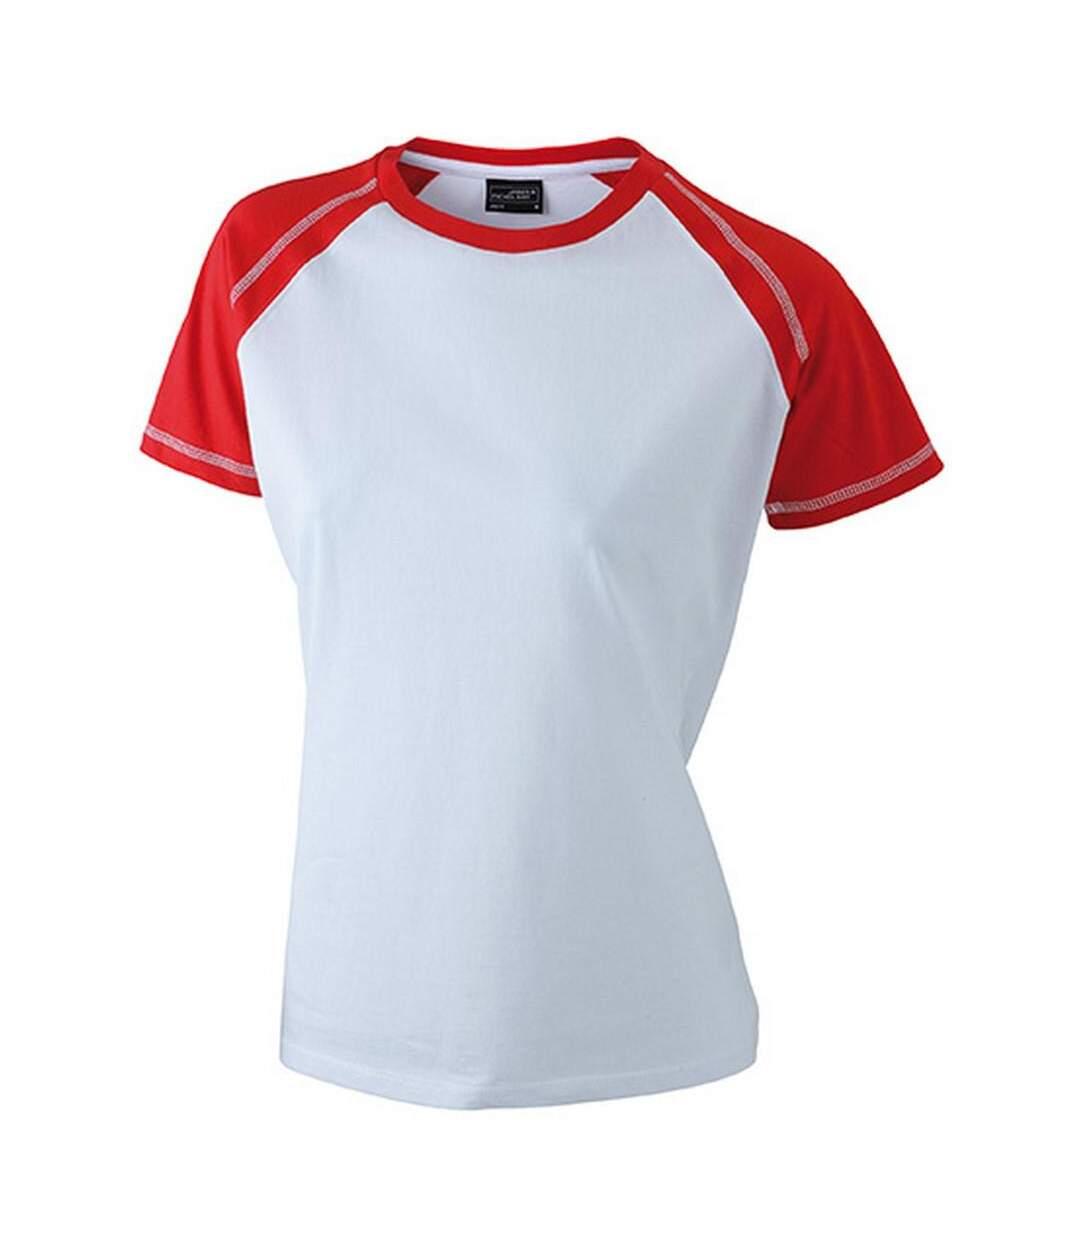 James And Nicholson - T-Shirt Bicolore - Femme (Blanc / rouge) - UTFU366